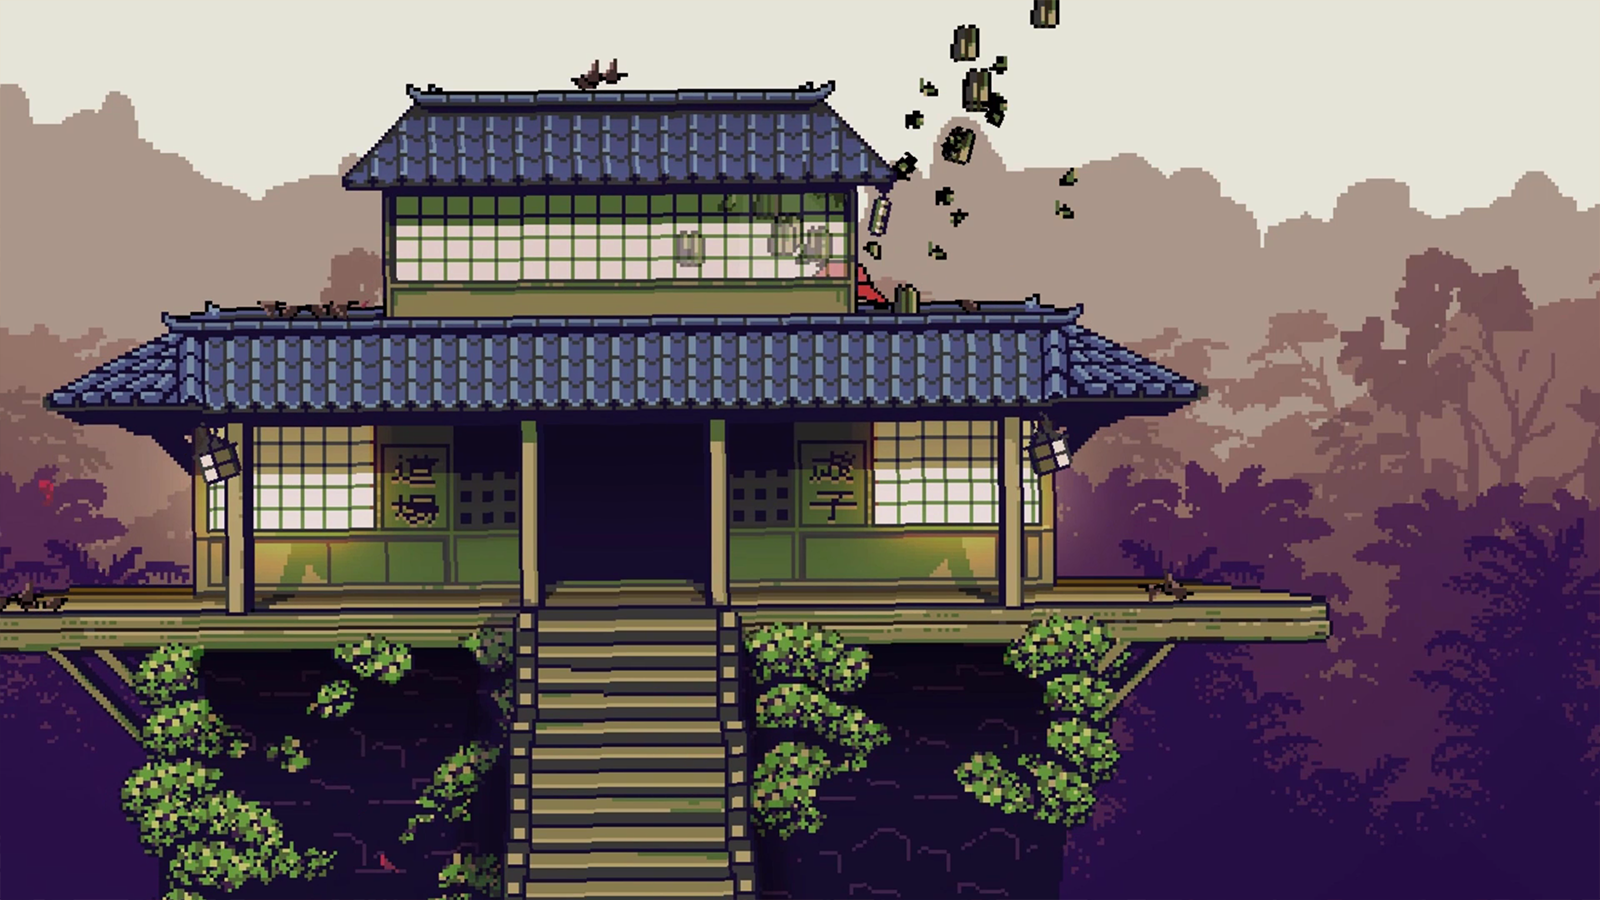 Roof Rage - Full Version Game Download - PcGameFreeTop